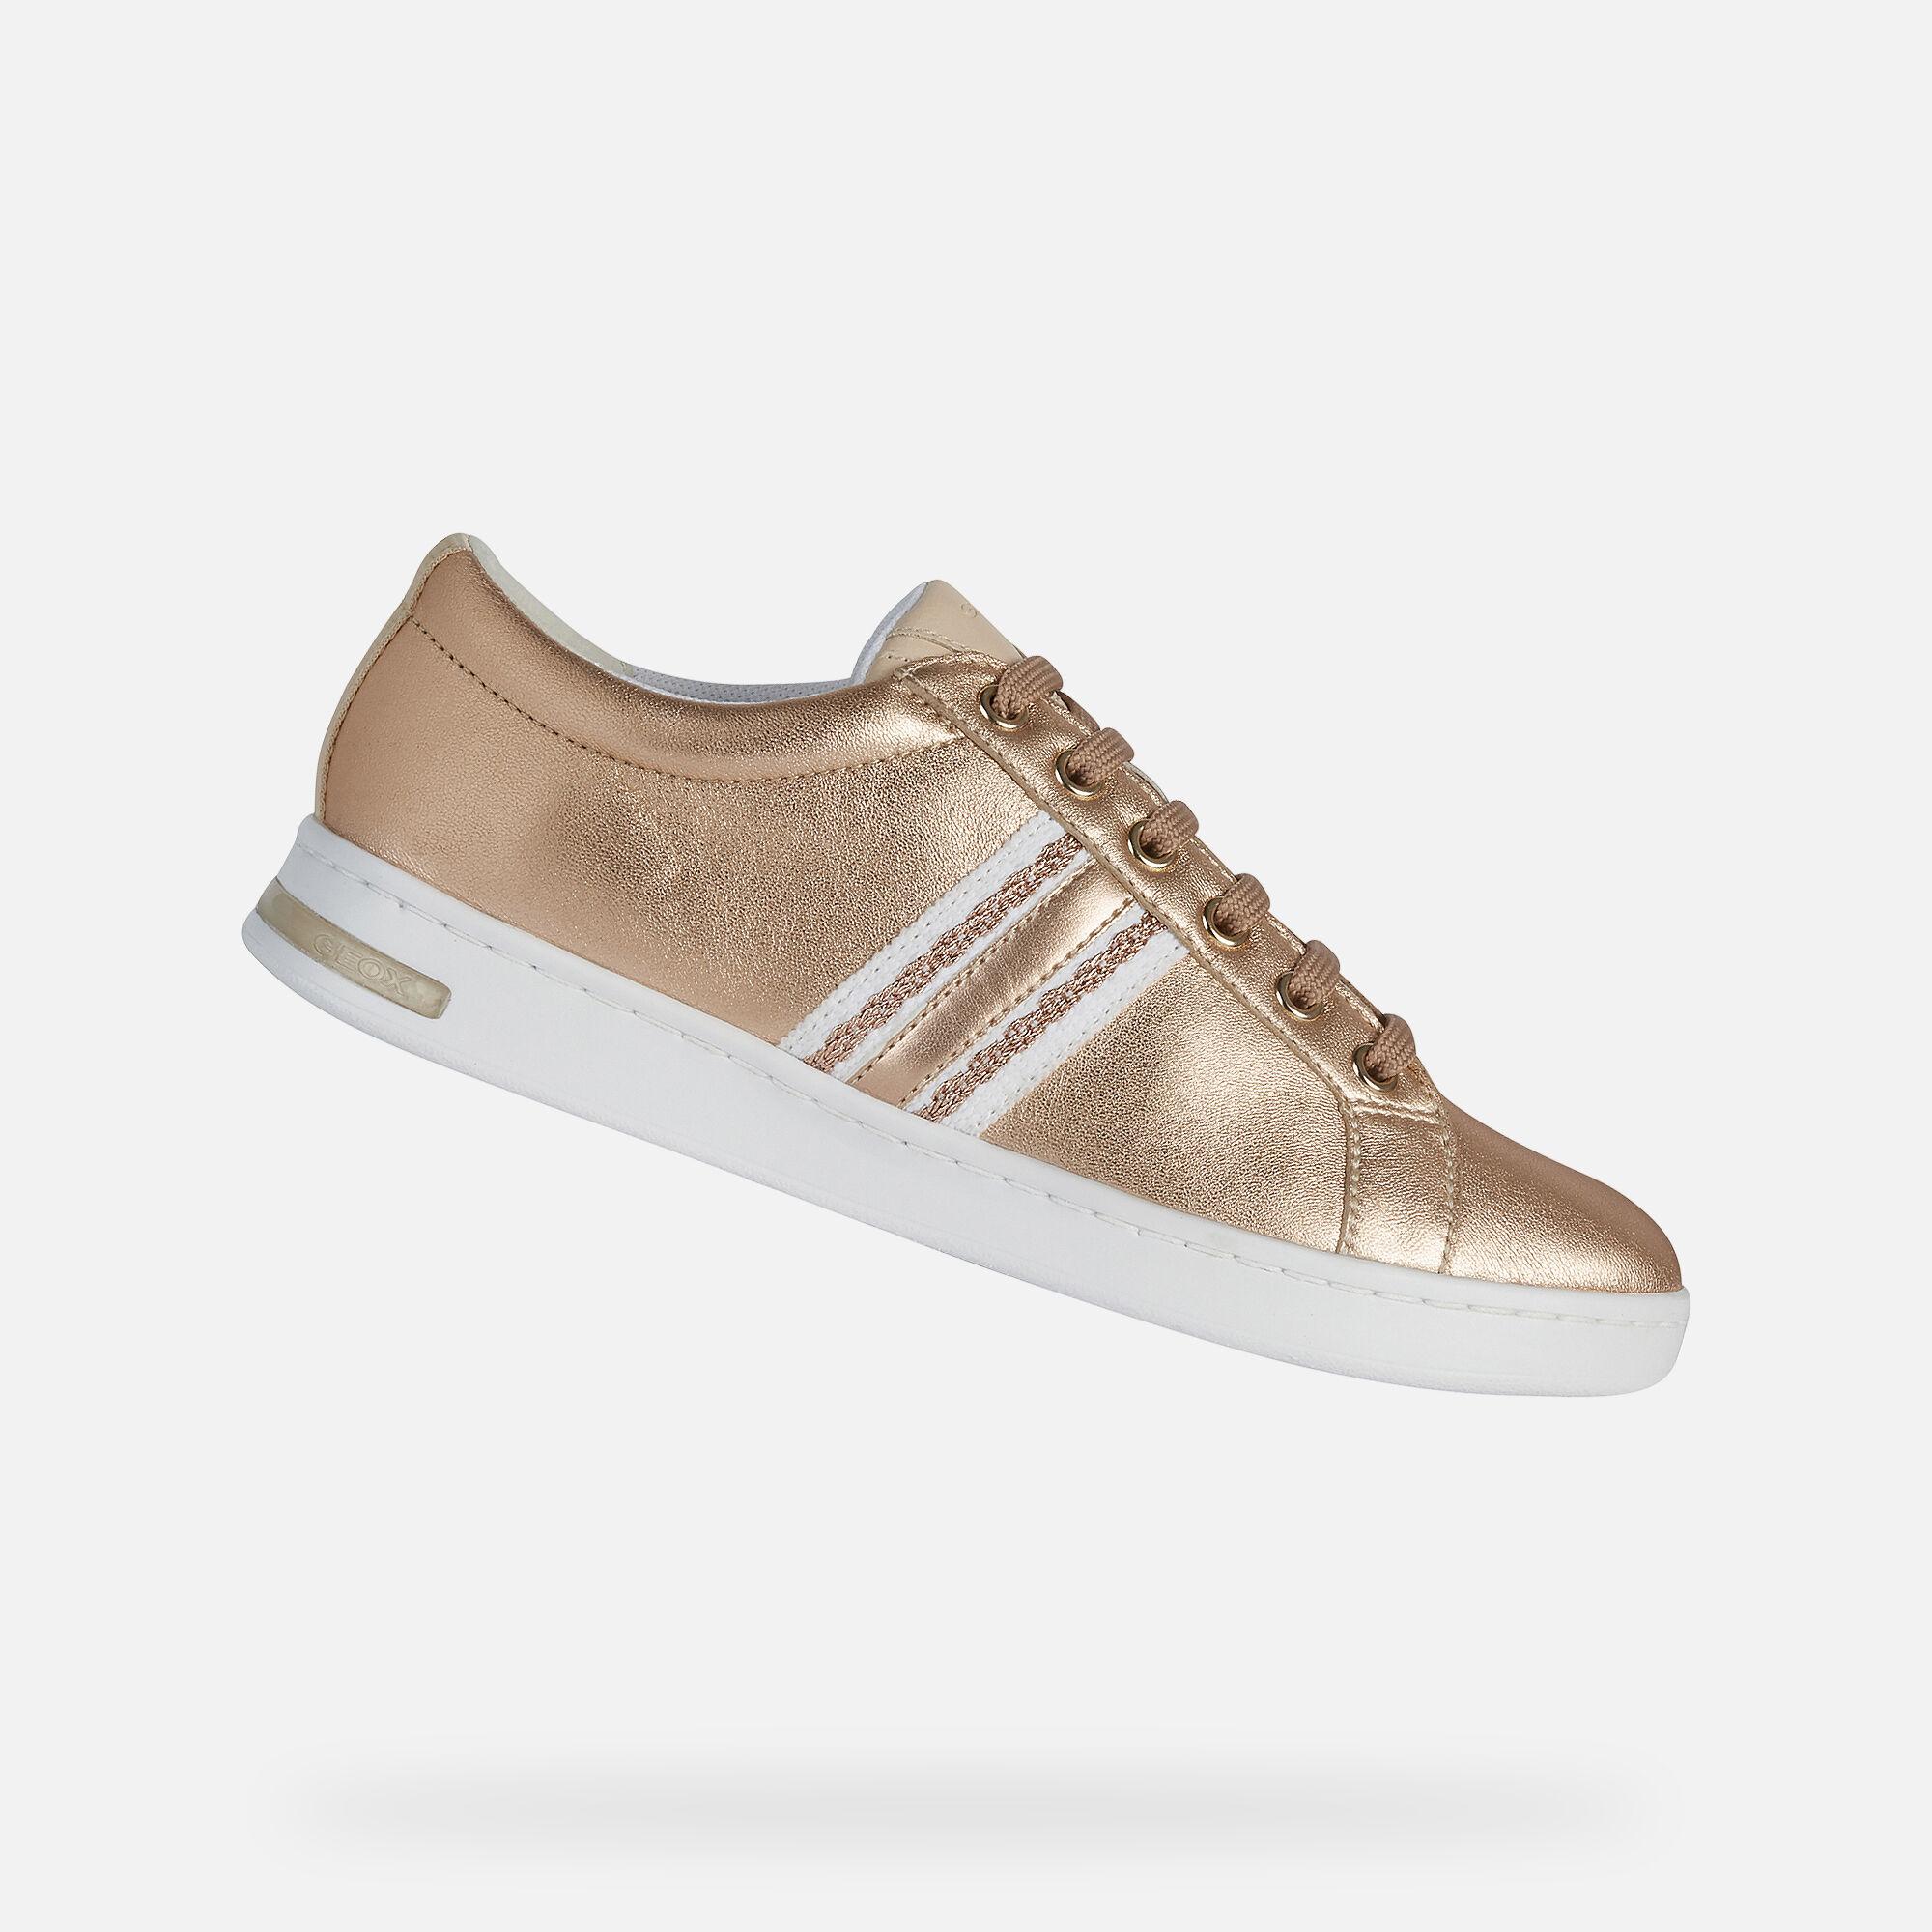 Geox JAYSEN Woman: Rose Gold Sneakers